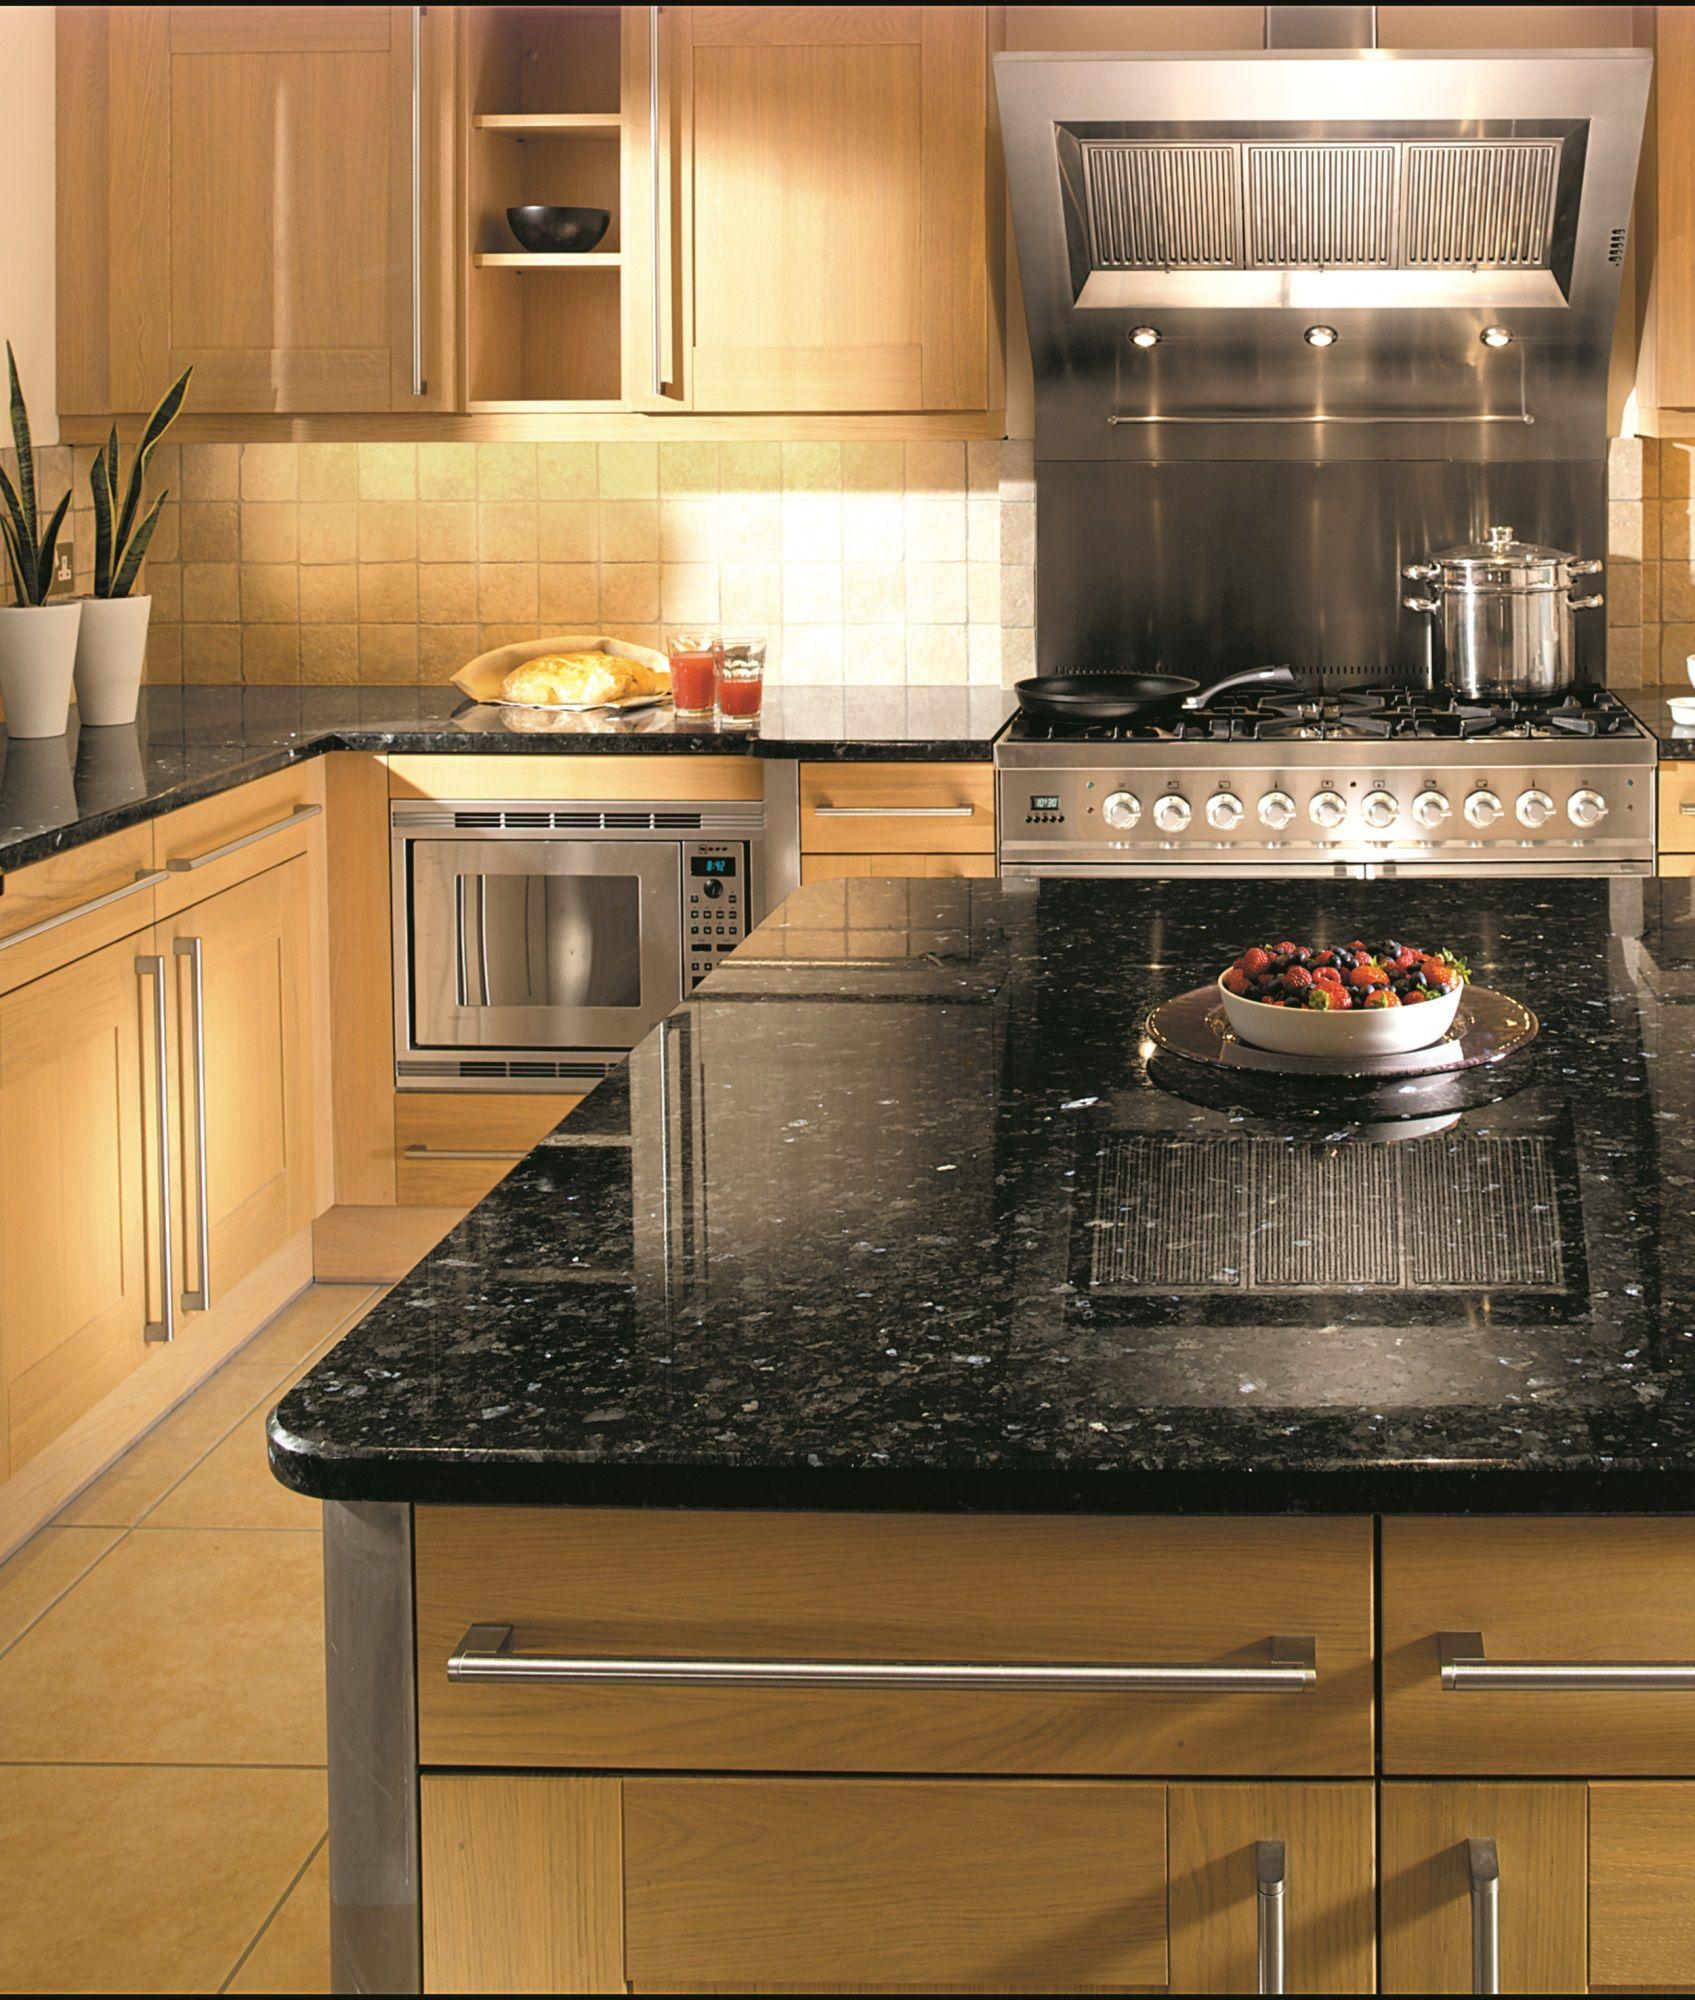 Granite Kitchen Worktoplandford Stonematerial Is Emerald Amazing Kitchen Design Granite Design Inspiration